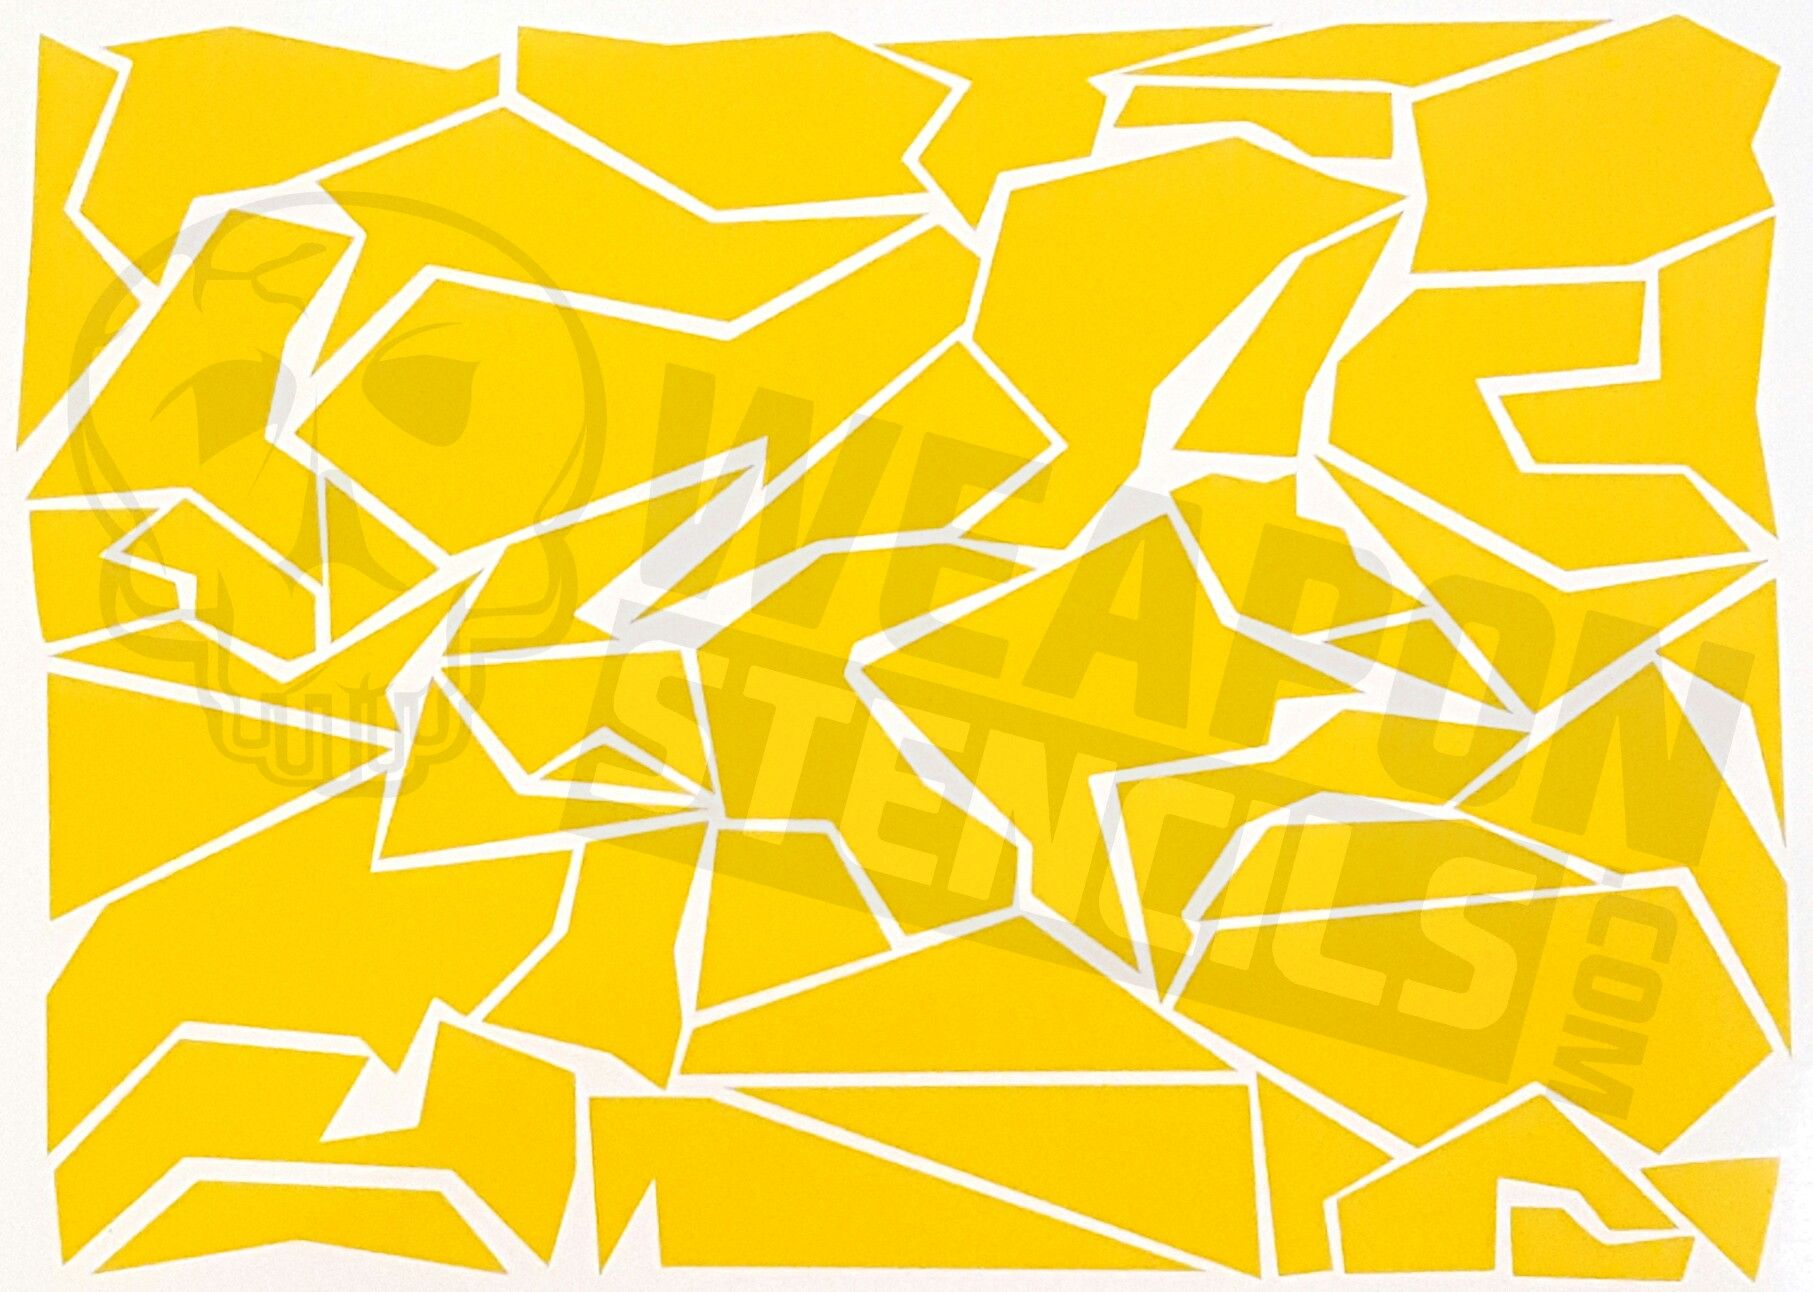 Splinter camo weapon stencils camo ideas pinterest camo splinter camo stencil inch sheet of heat resistant adhesive vinyl material amipublicfo Choice Image